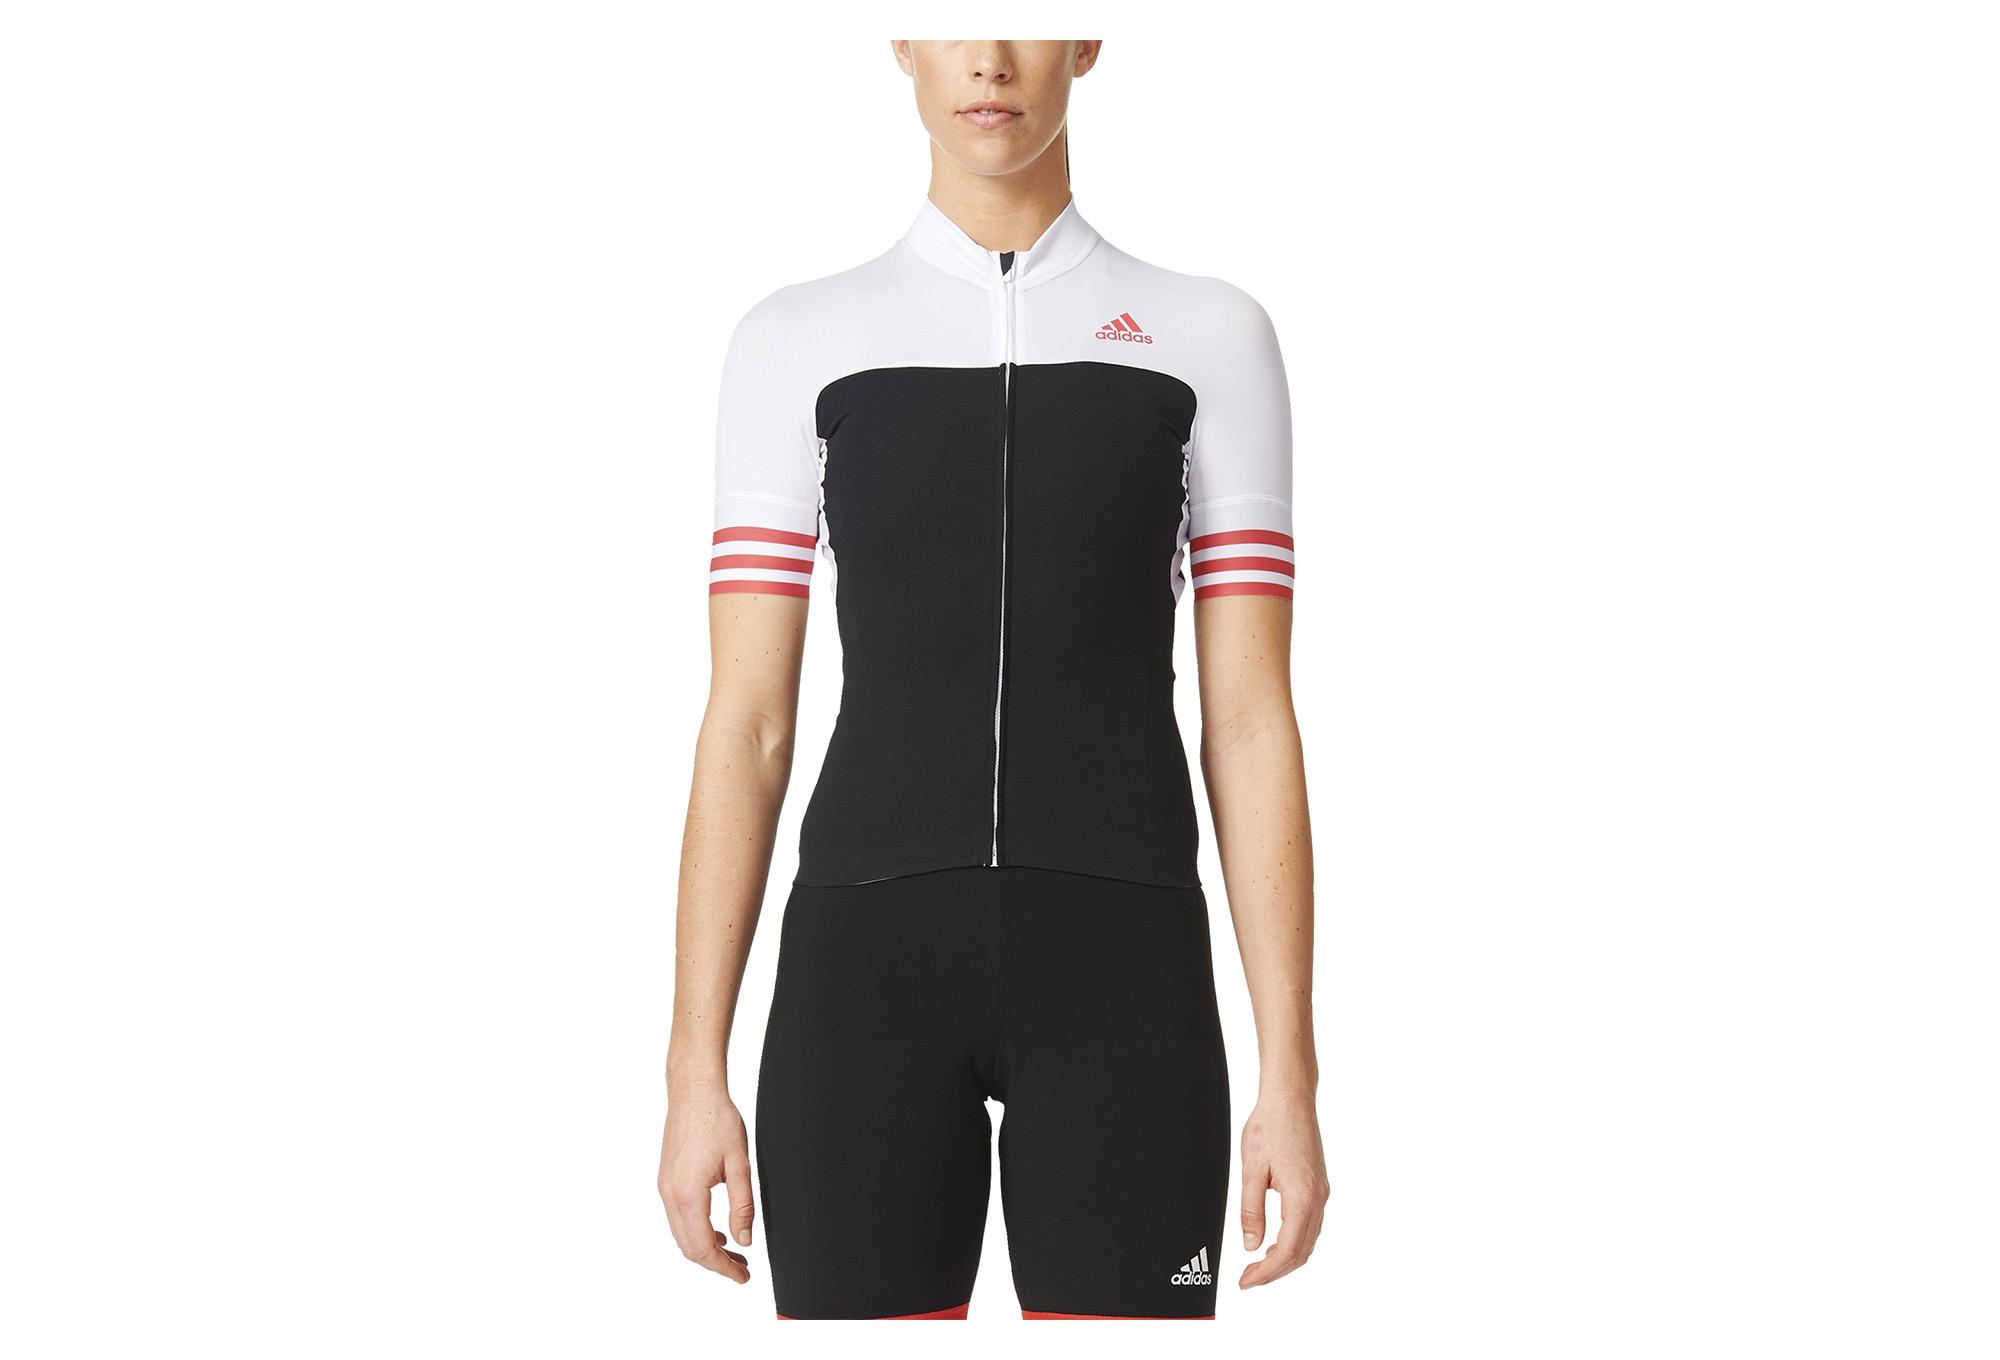 adidas adistar CD.ZERO 3 Short Sleeves Jersey Black White Red Women ... 4ffb7ade2